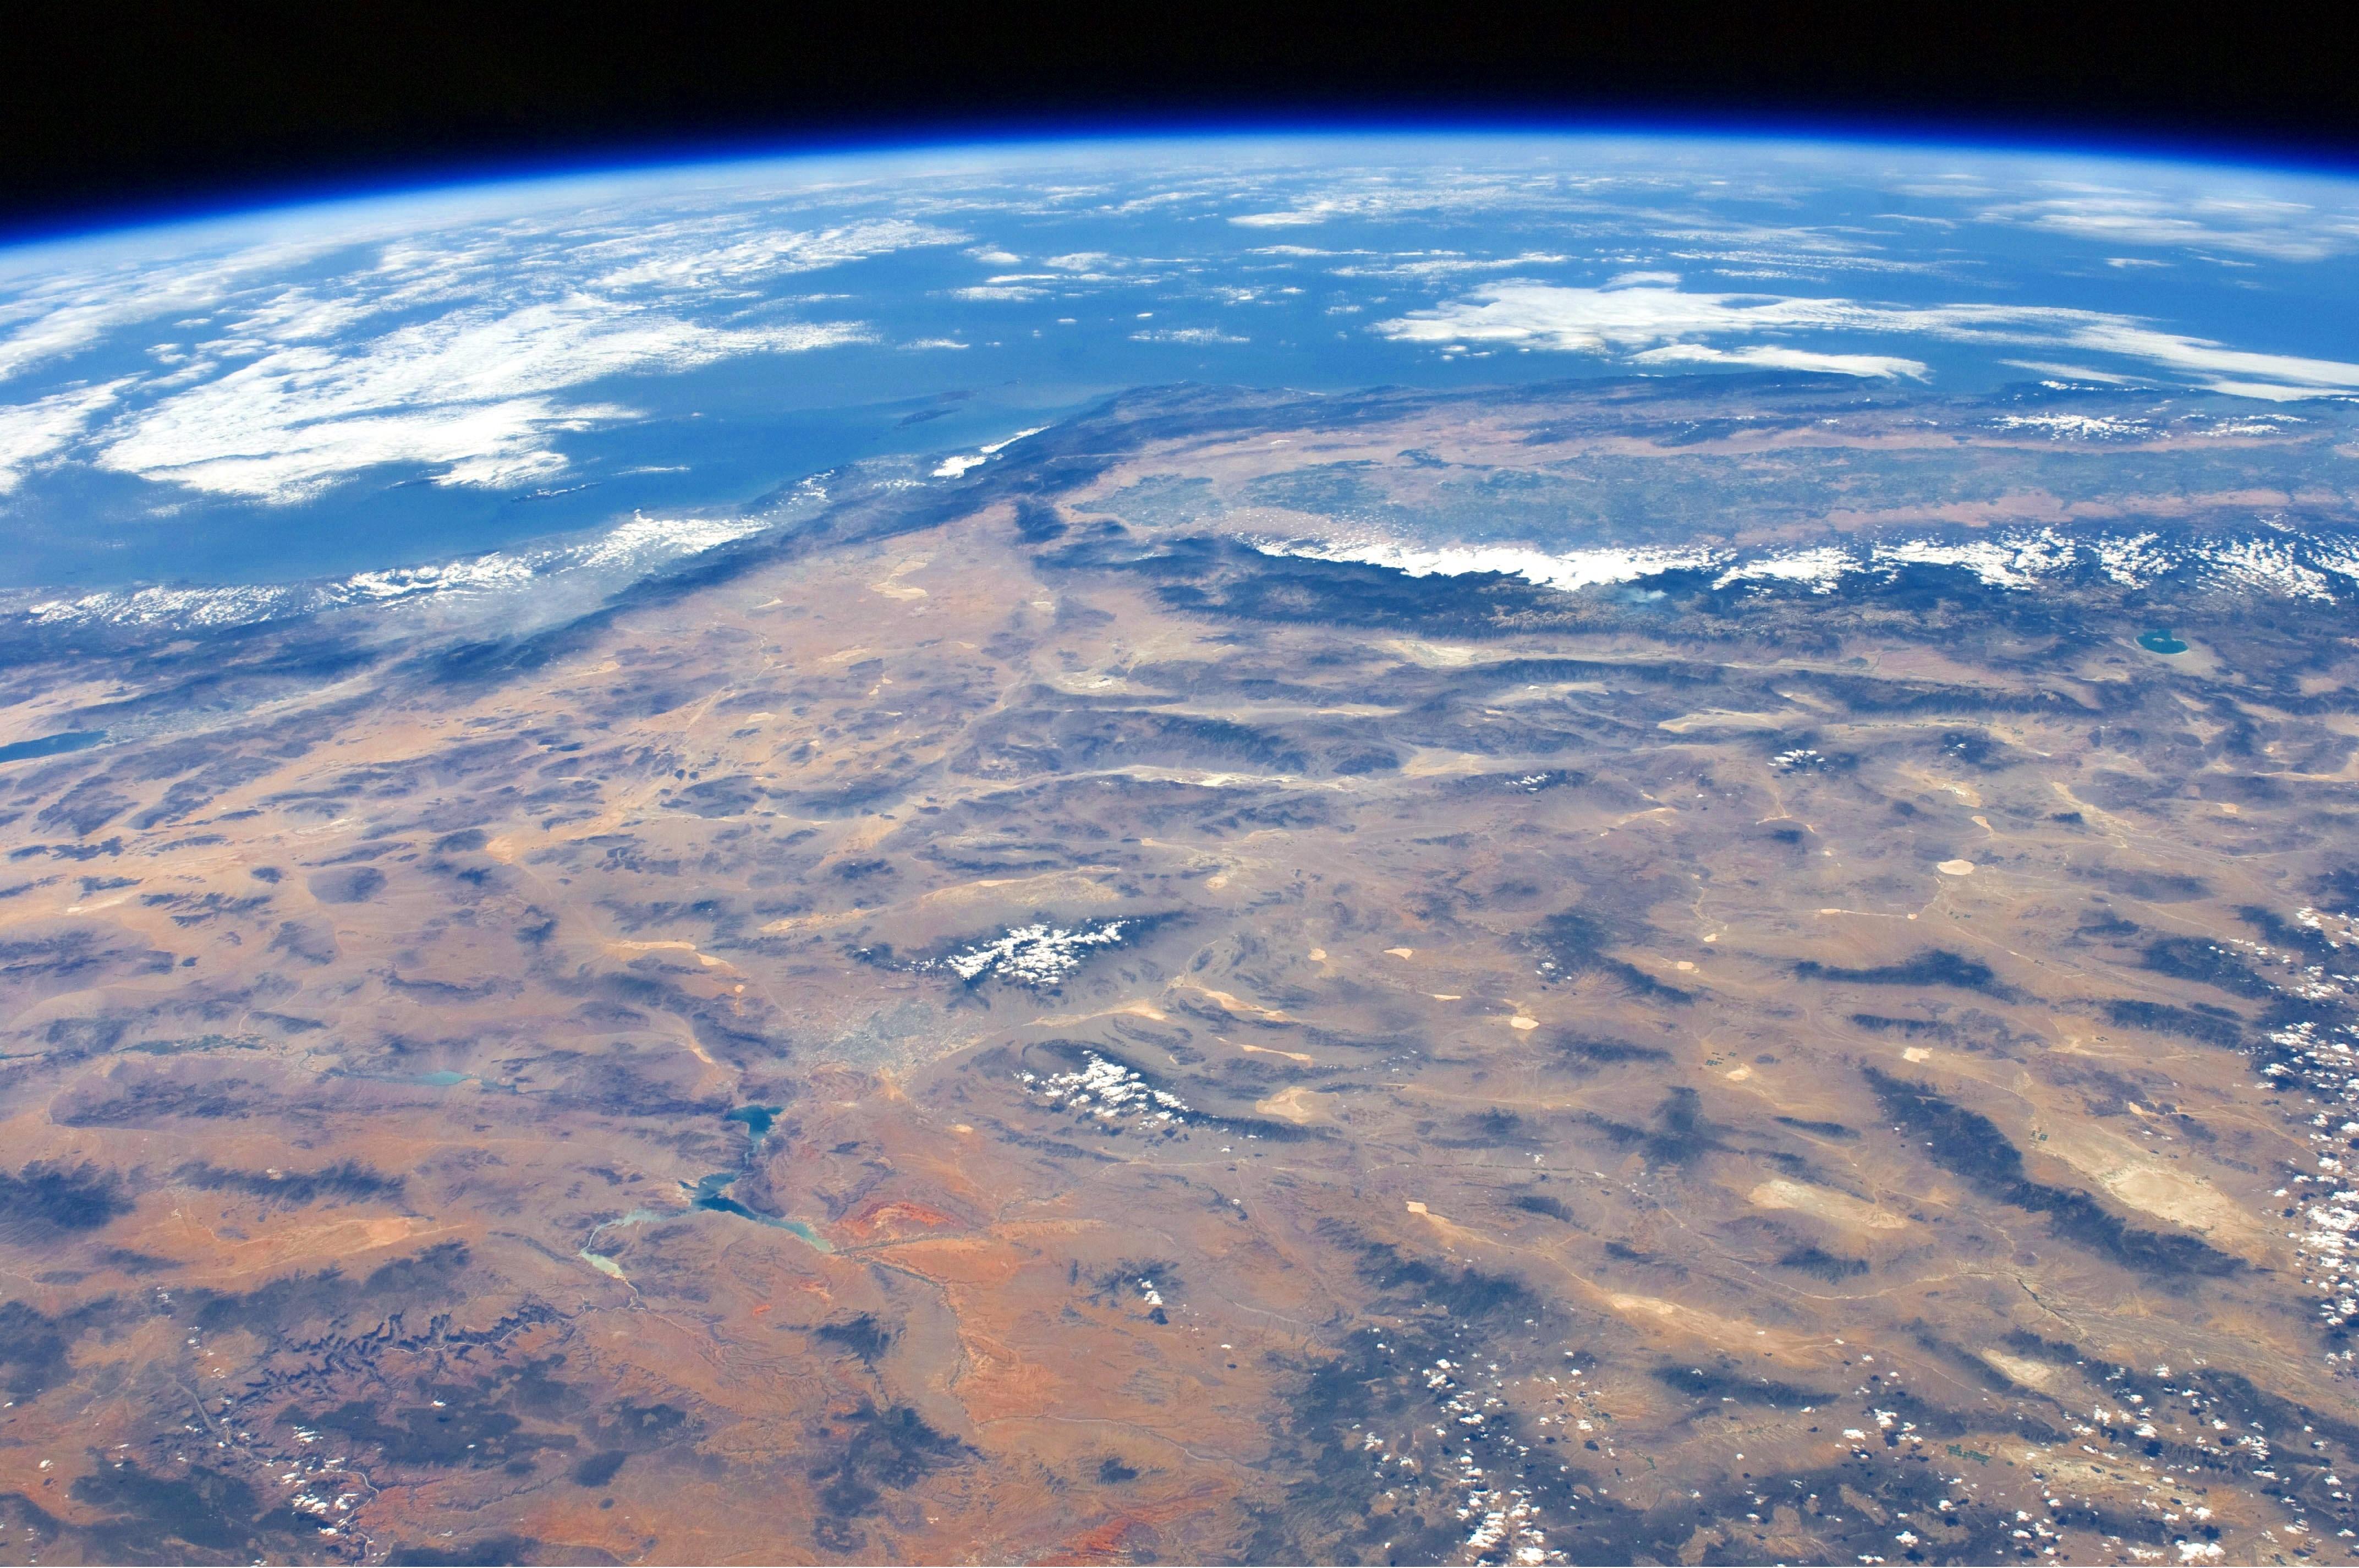 FileISS View of the Southwestern USAJPG FileISS